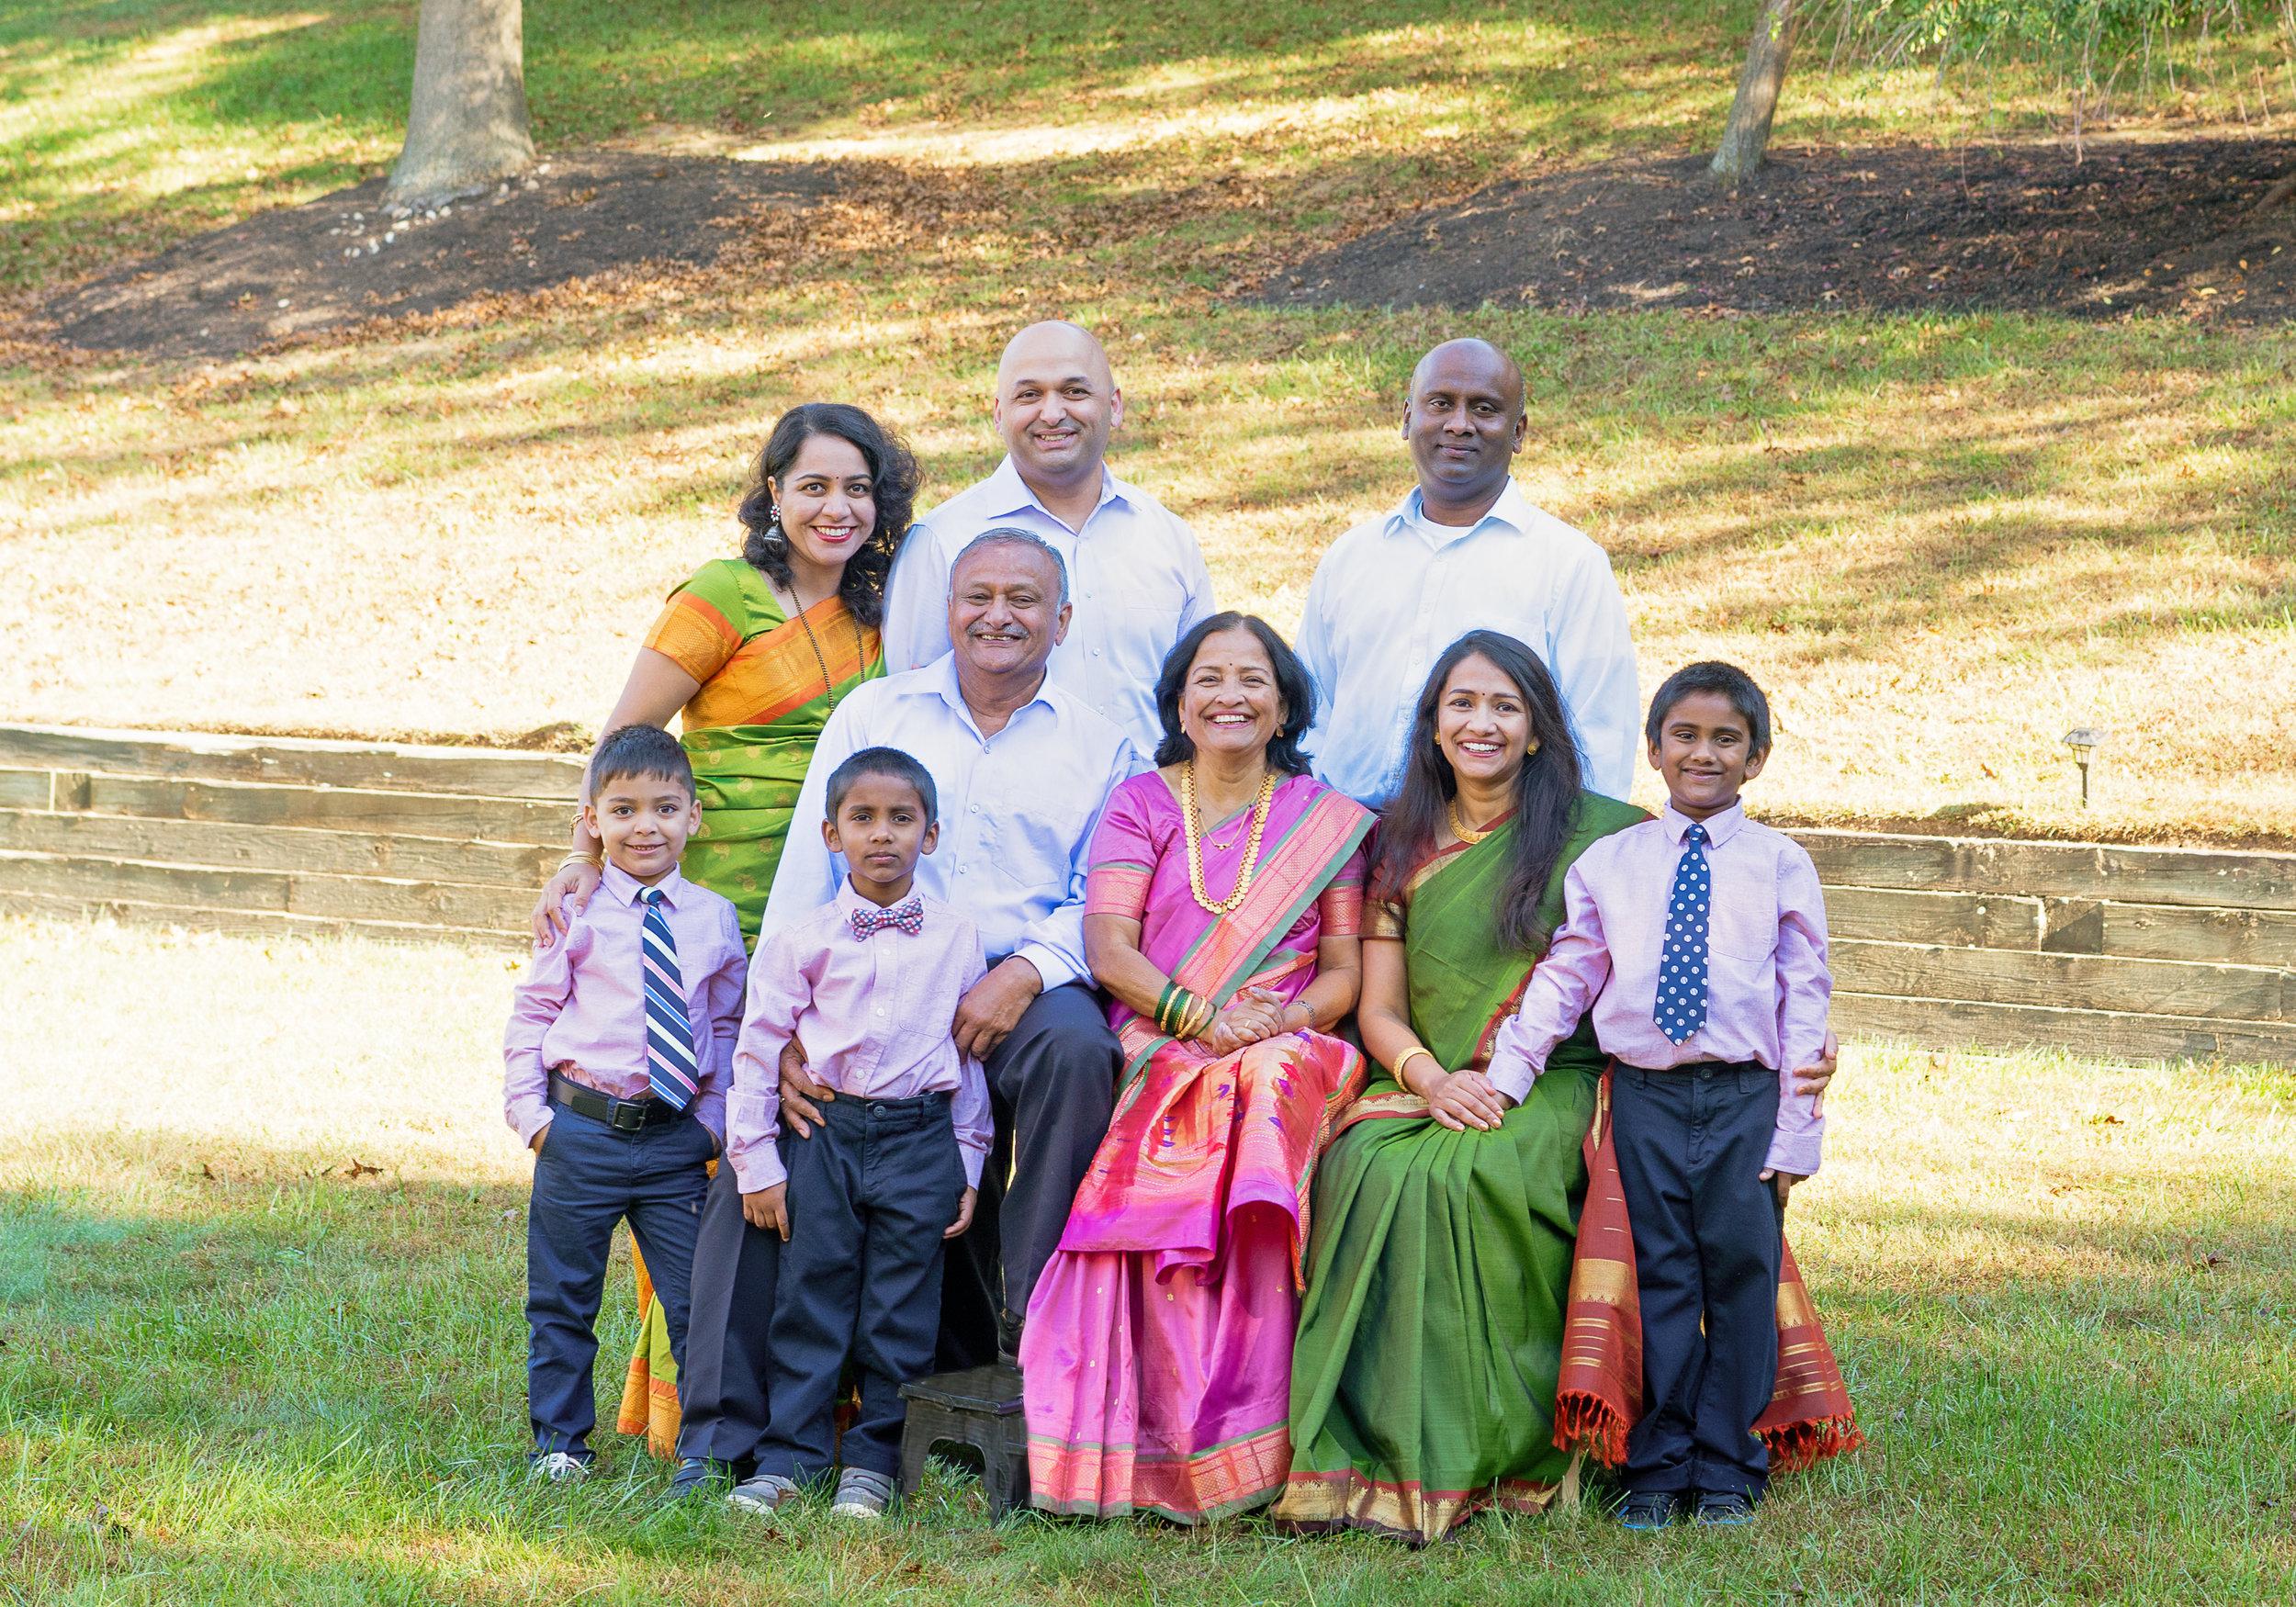 family-portrait-photographer-princeton.JPG